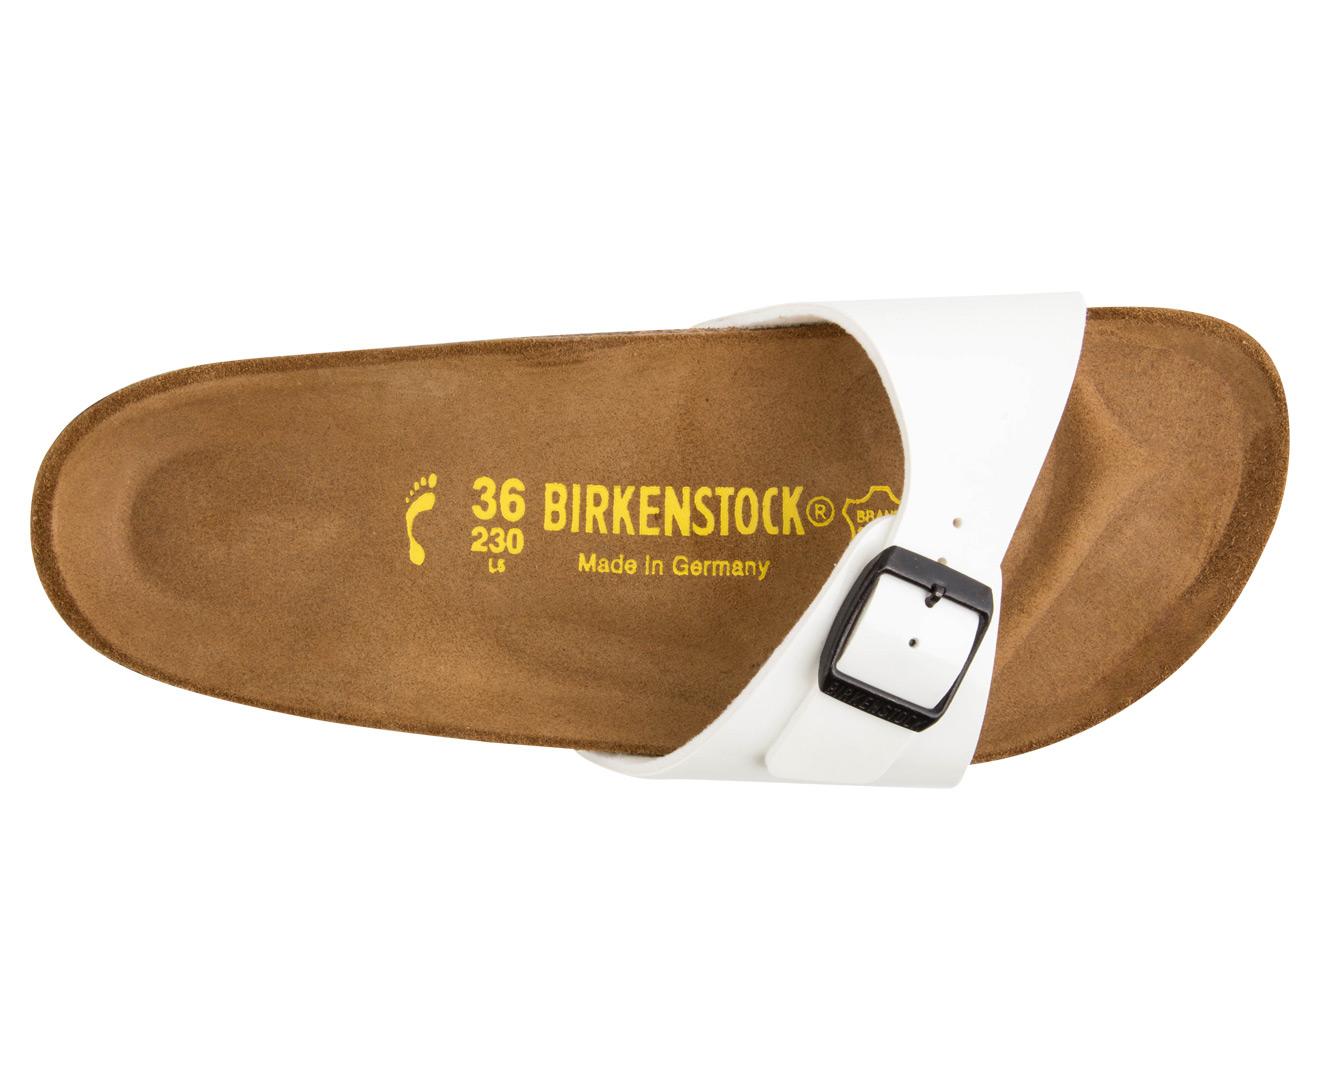 3b95cc37f08 Birkenstock Madrid Birko-Flor Narrow Fit Sandal - White